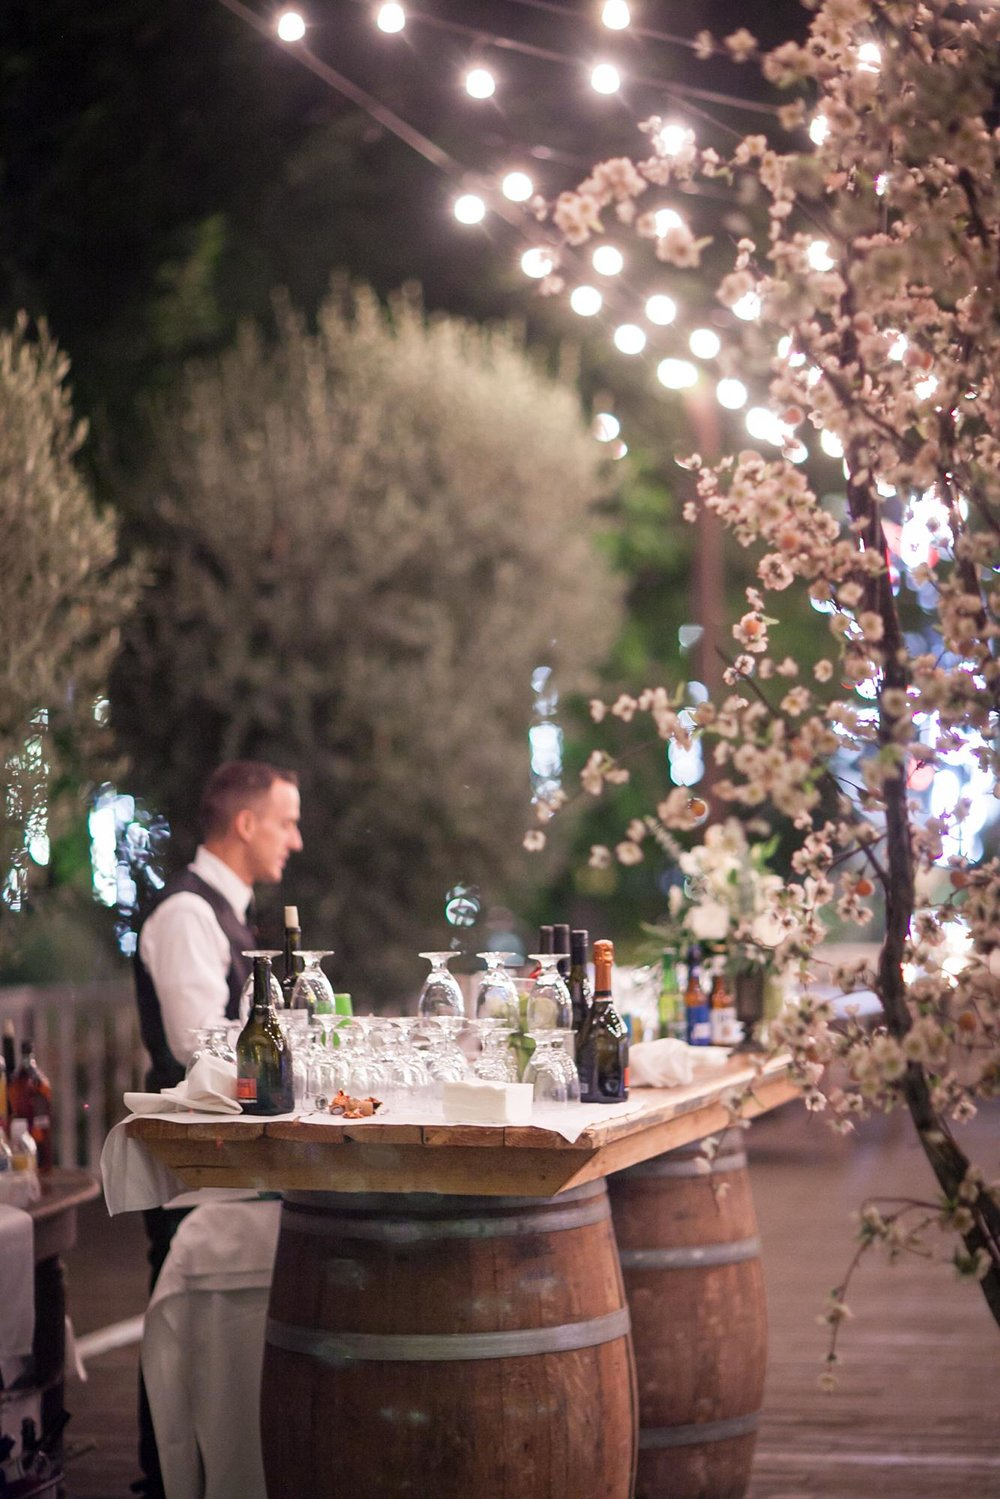 Calamigos Ranch Wedding | Miki & Sonja Photography | mikiandsonja.com